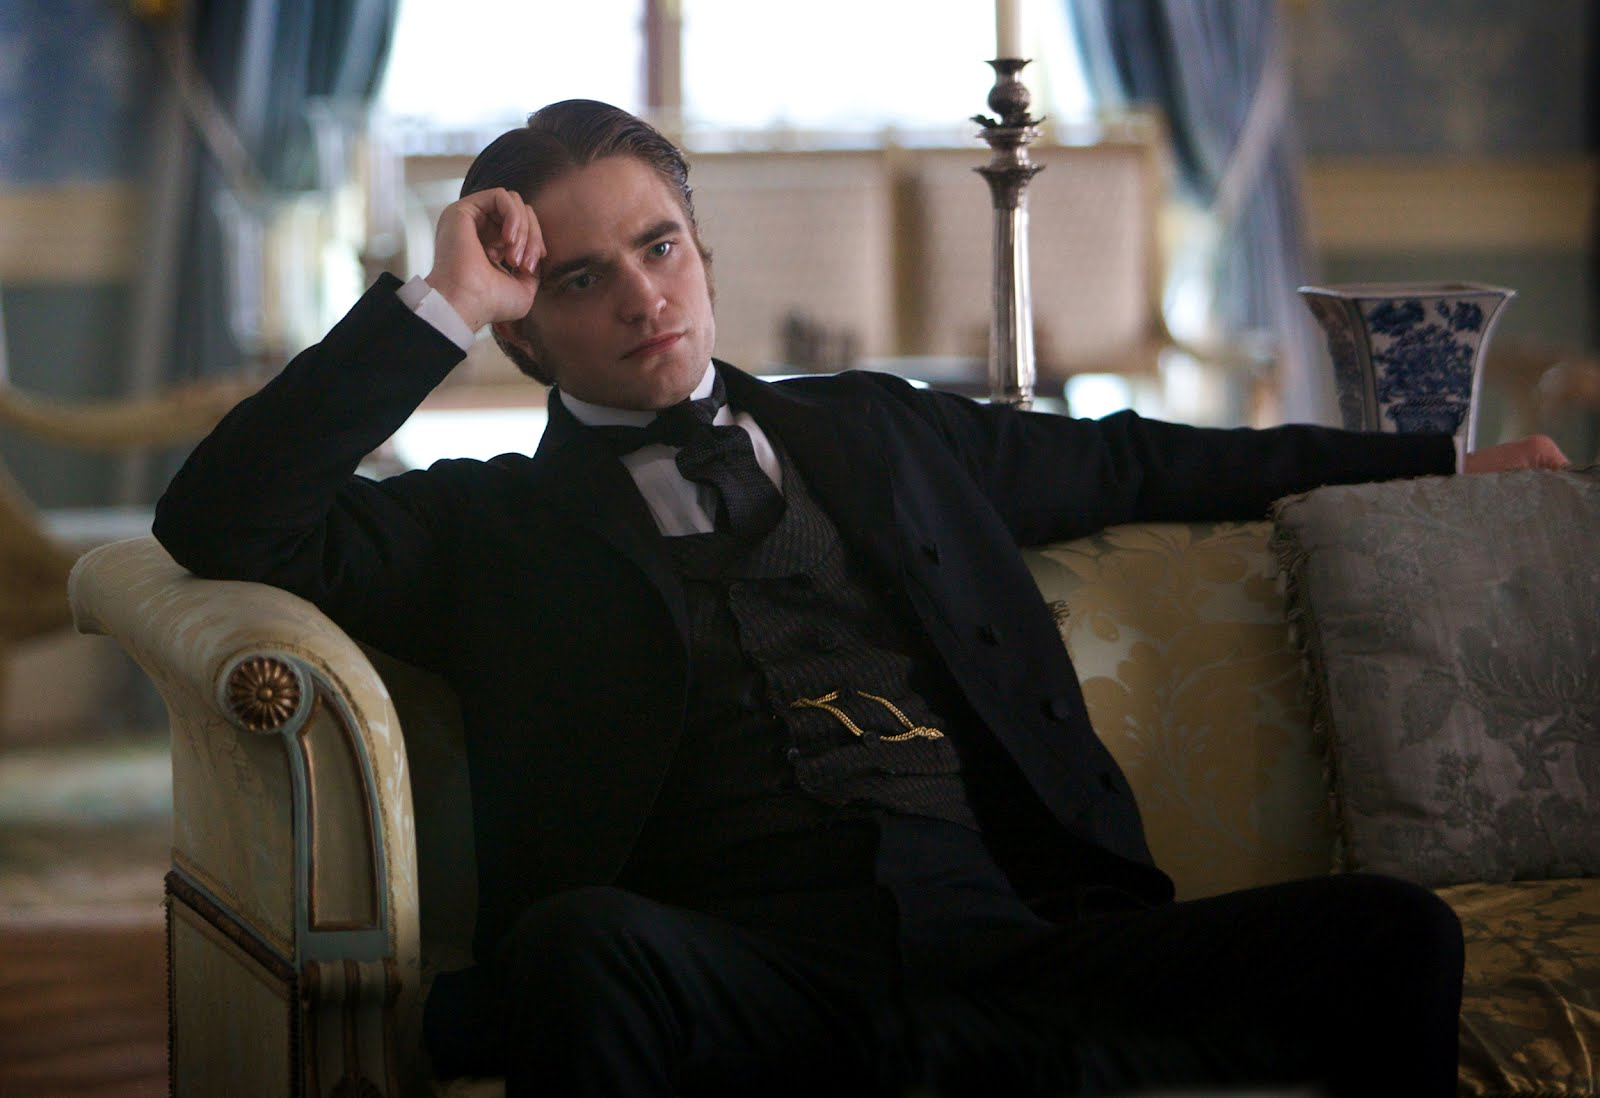 http://2.bp.blogspot.com/-ndke3xnGD8M/T3GarNuW3bI/AAAAAAAAUUc/p2tYmAK4uc0/s1600/Bel_Ami_Robert-Pattinson_movie_image-2.jpg